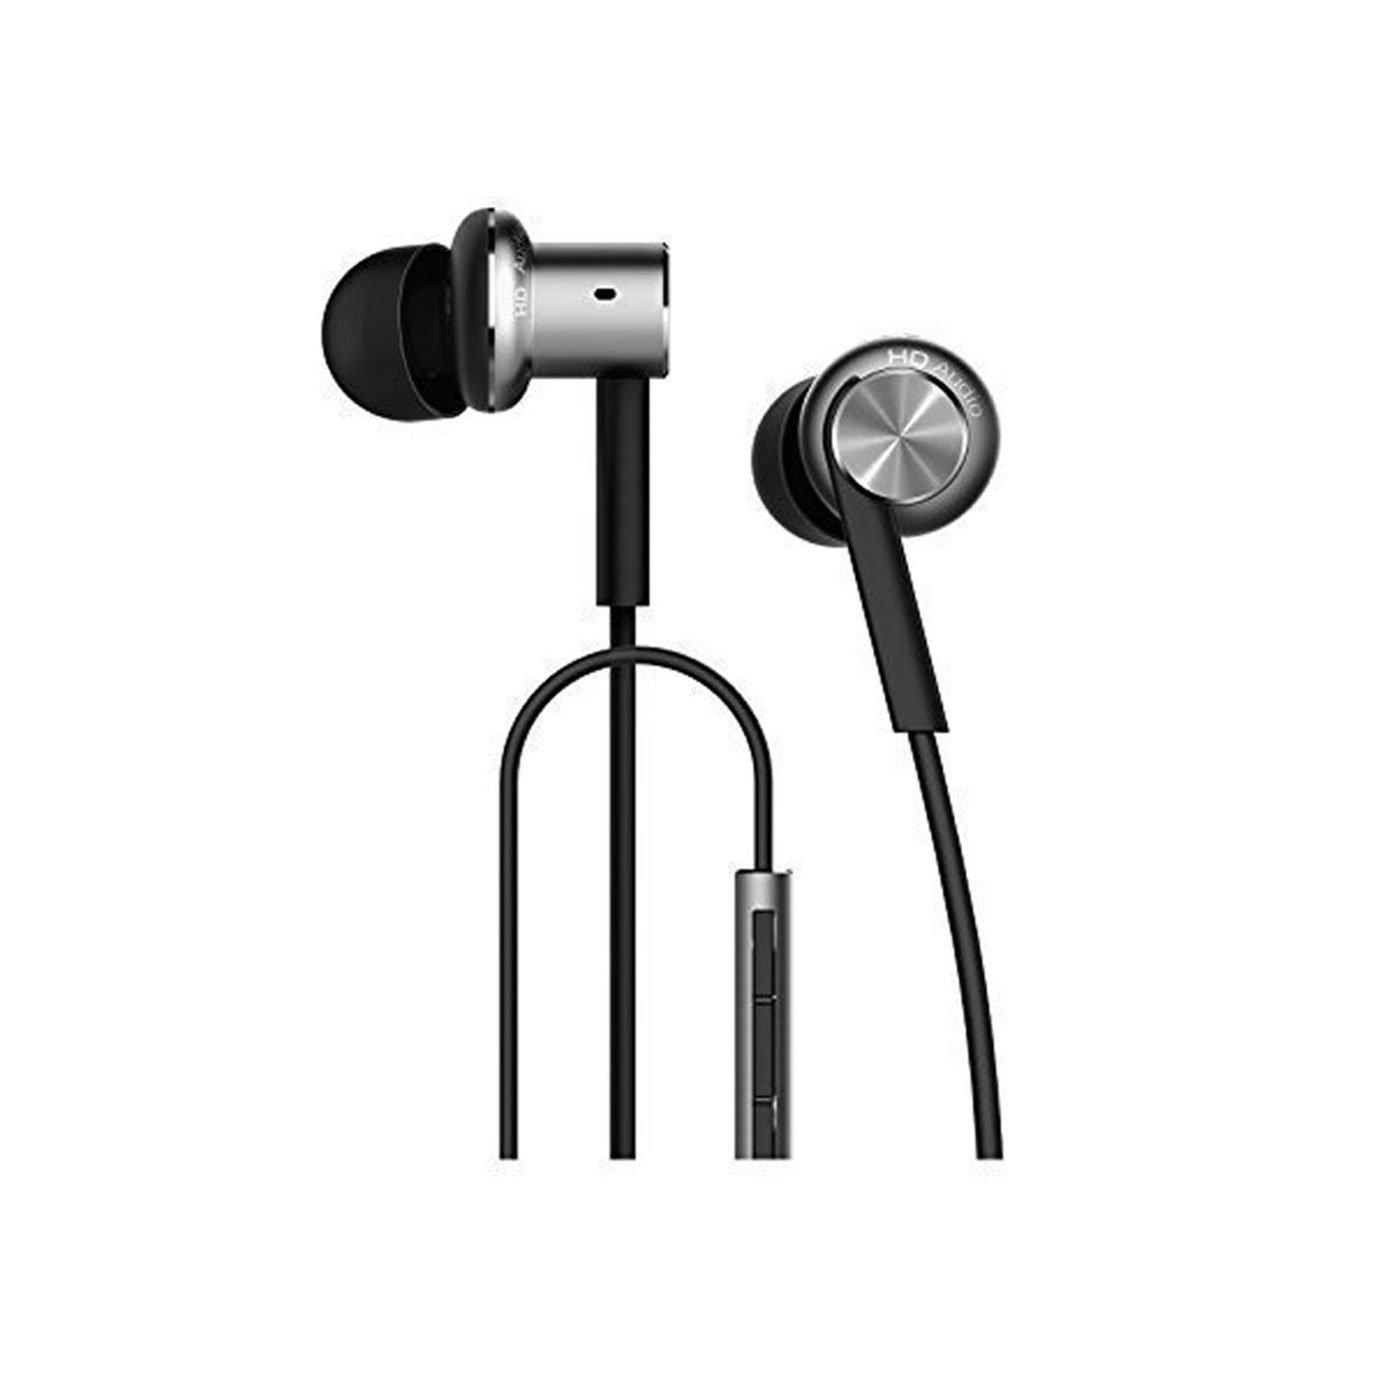 Amazon Xiaomi Headphone Mi Hybrid In Ear Stereo Earphones With Mic In Ear Earphone Sliver For Handphones fice Products